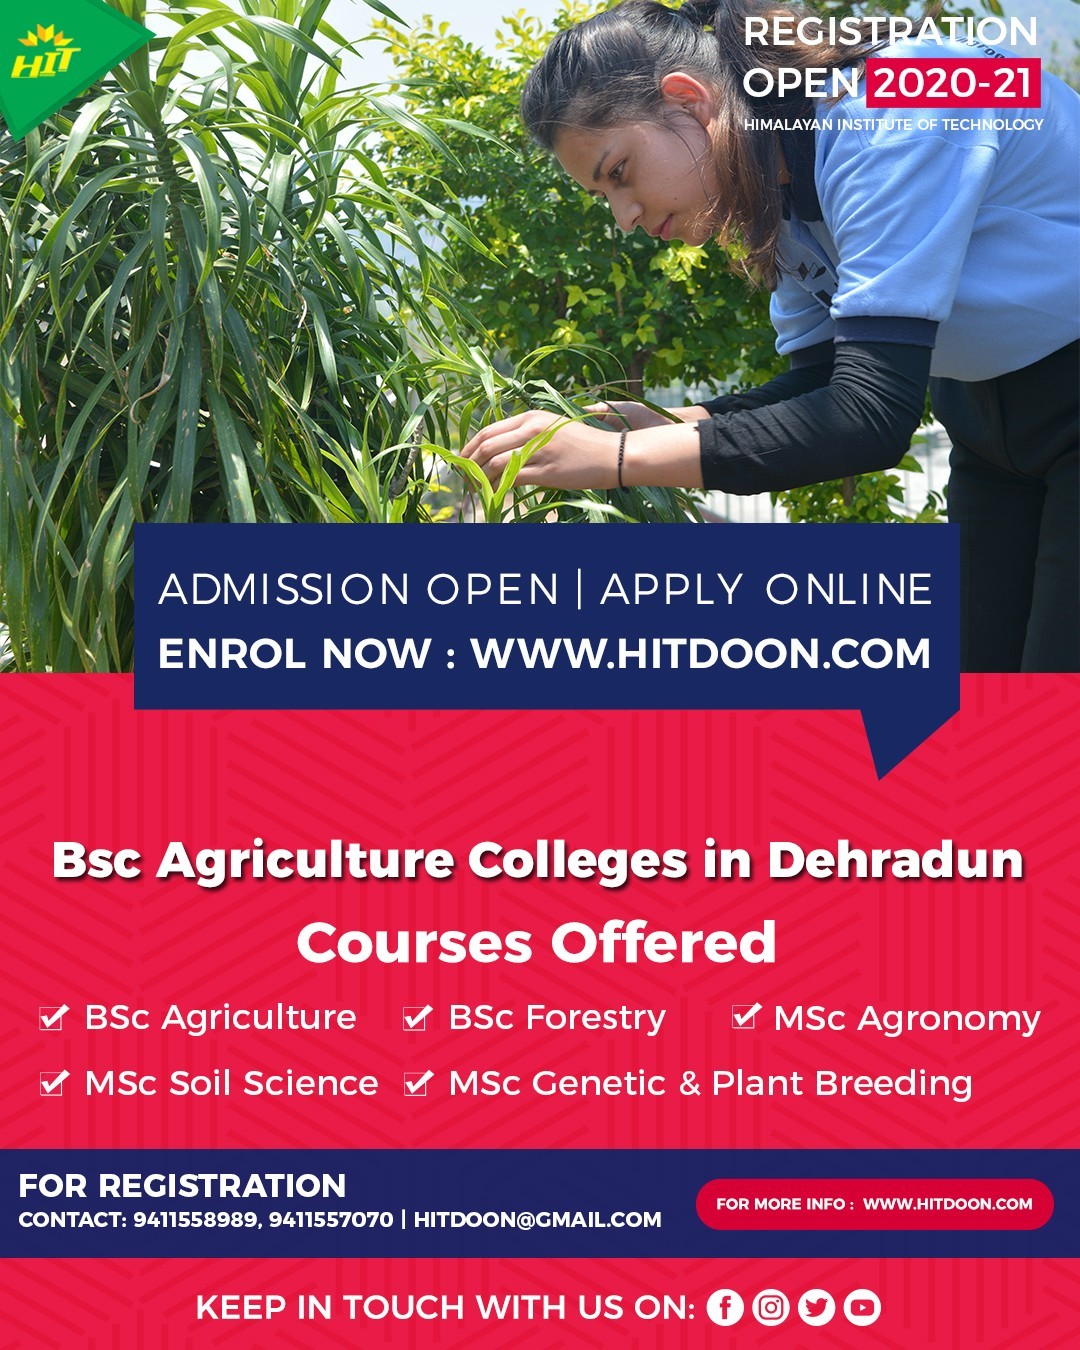 Bsc Agriculture Colleges in Dehradun